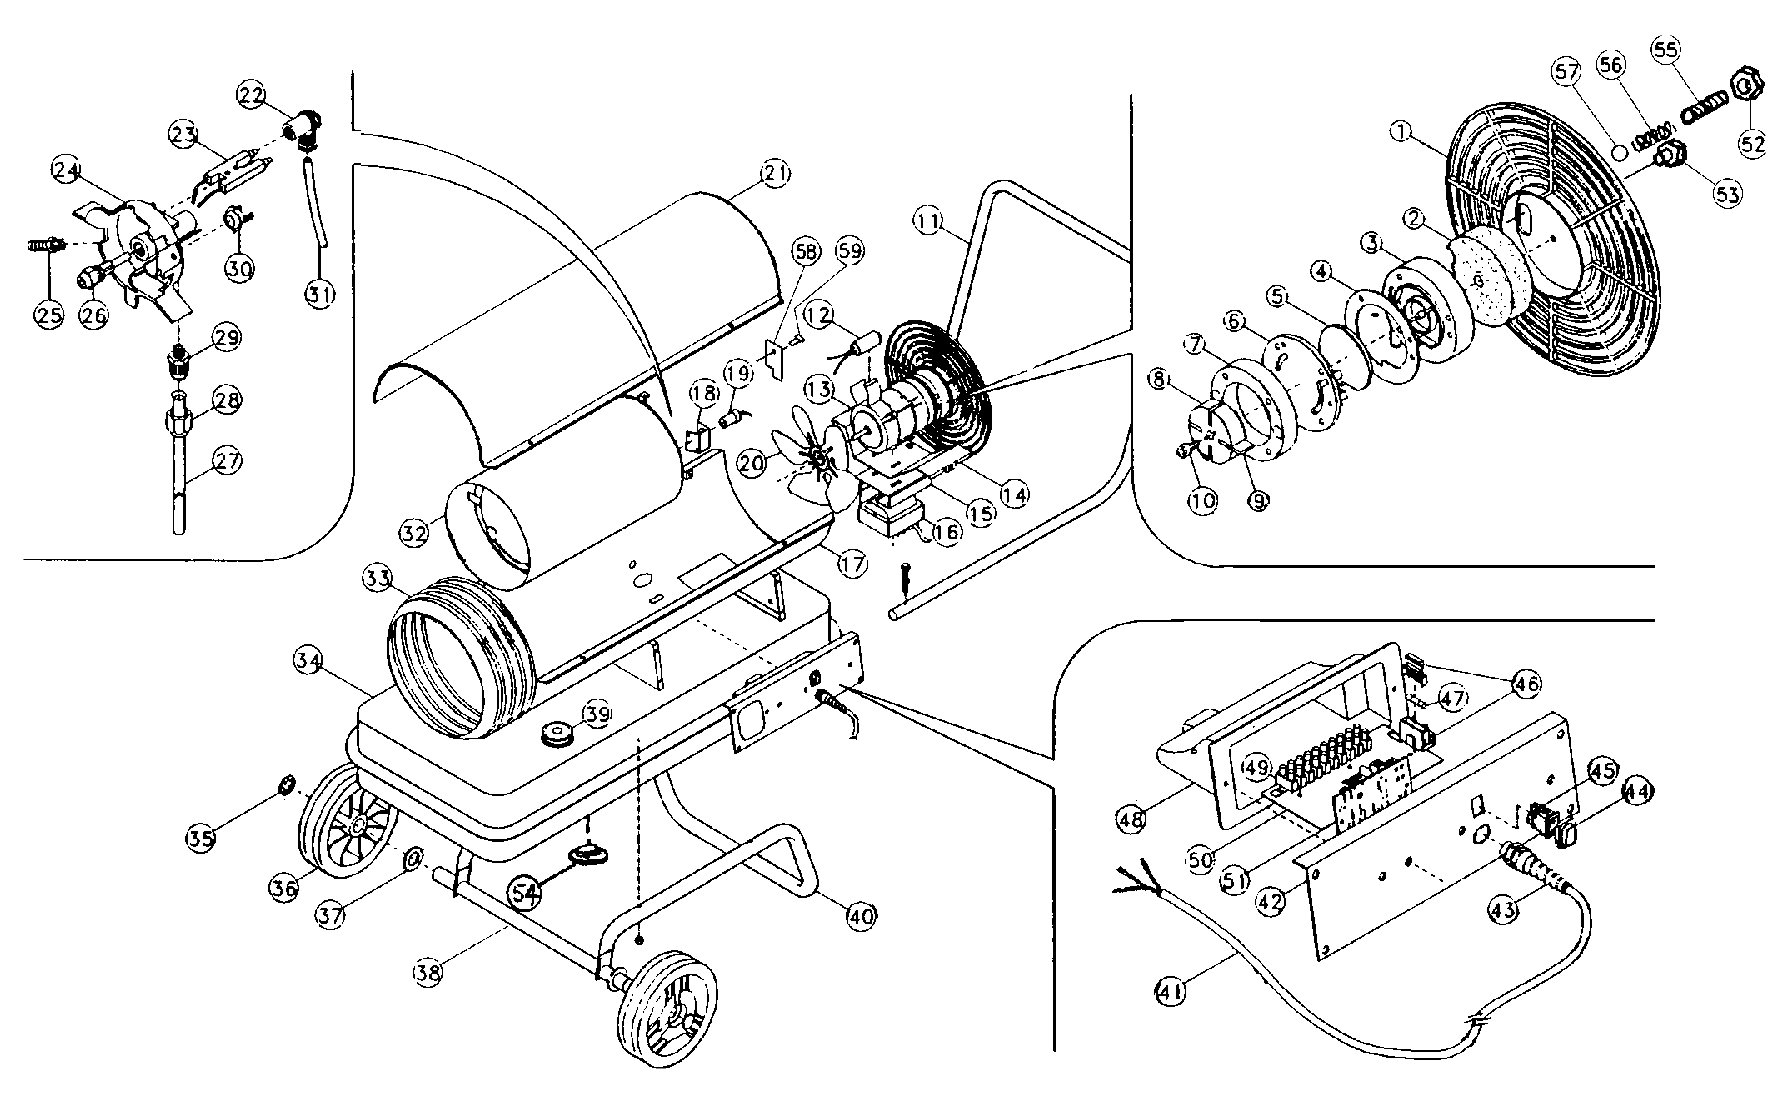 2 Pole 240 Volt Contactor Wiring Diagram